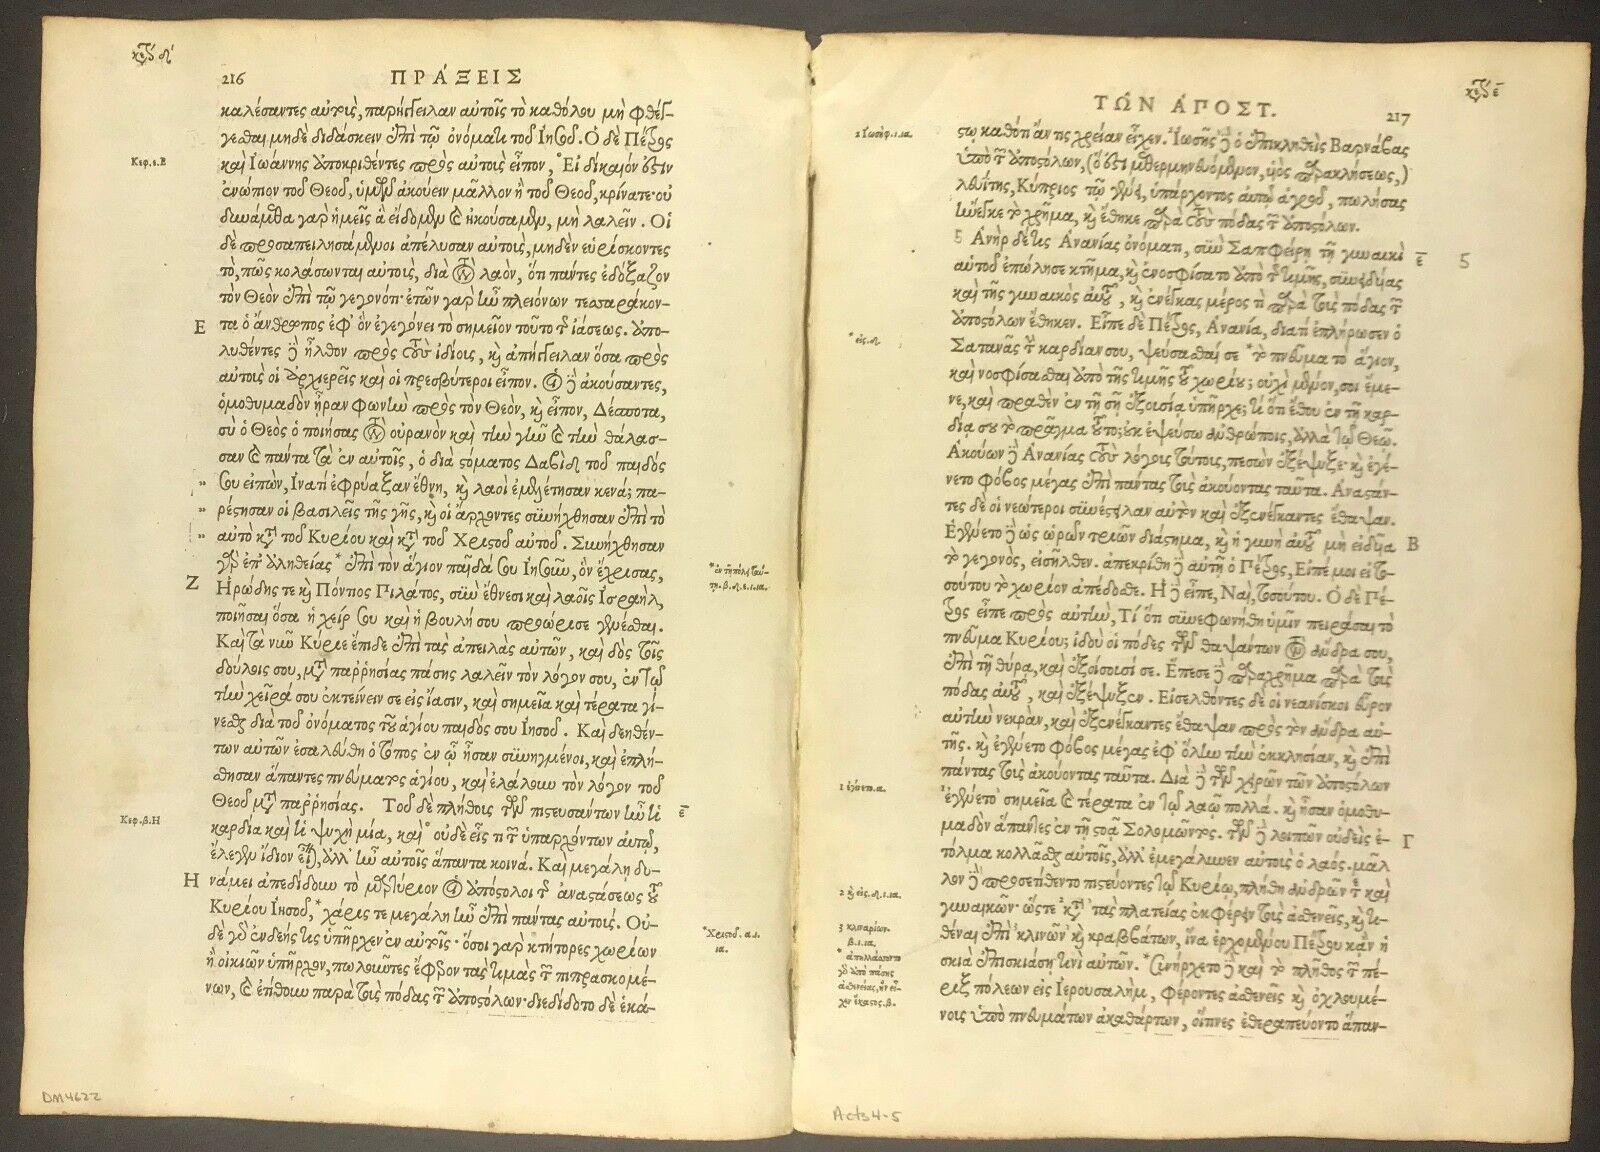 viaLibri ~ 1550 STEPHANUS GREEK BIBLE LEAF BASIS OF1611 KING JAMES